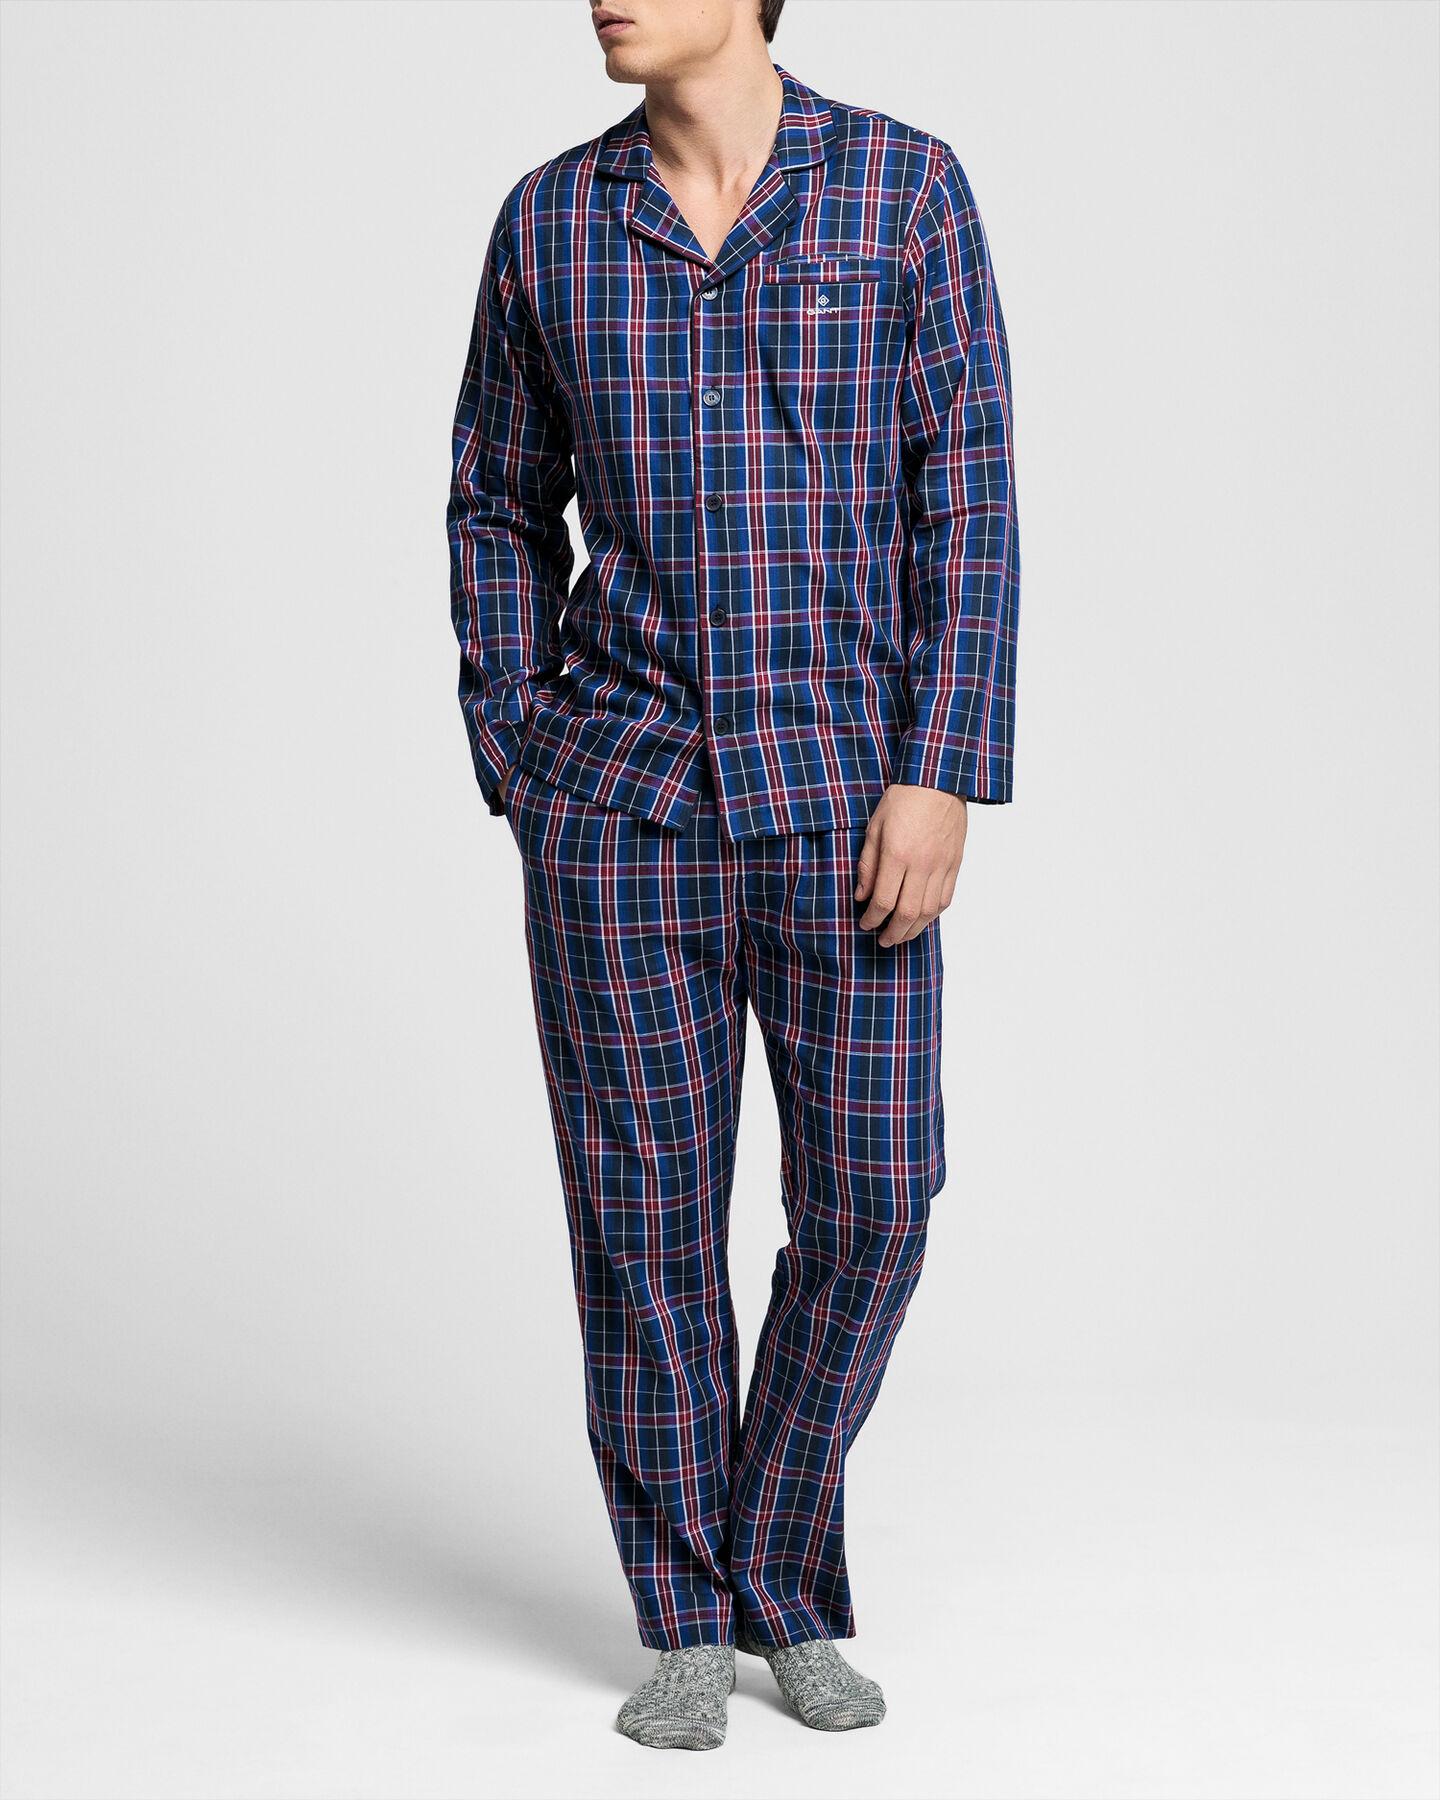 Pyjama mit Tartan-Muster